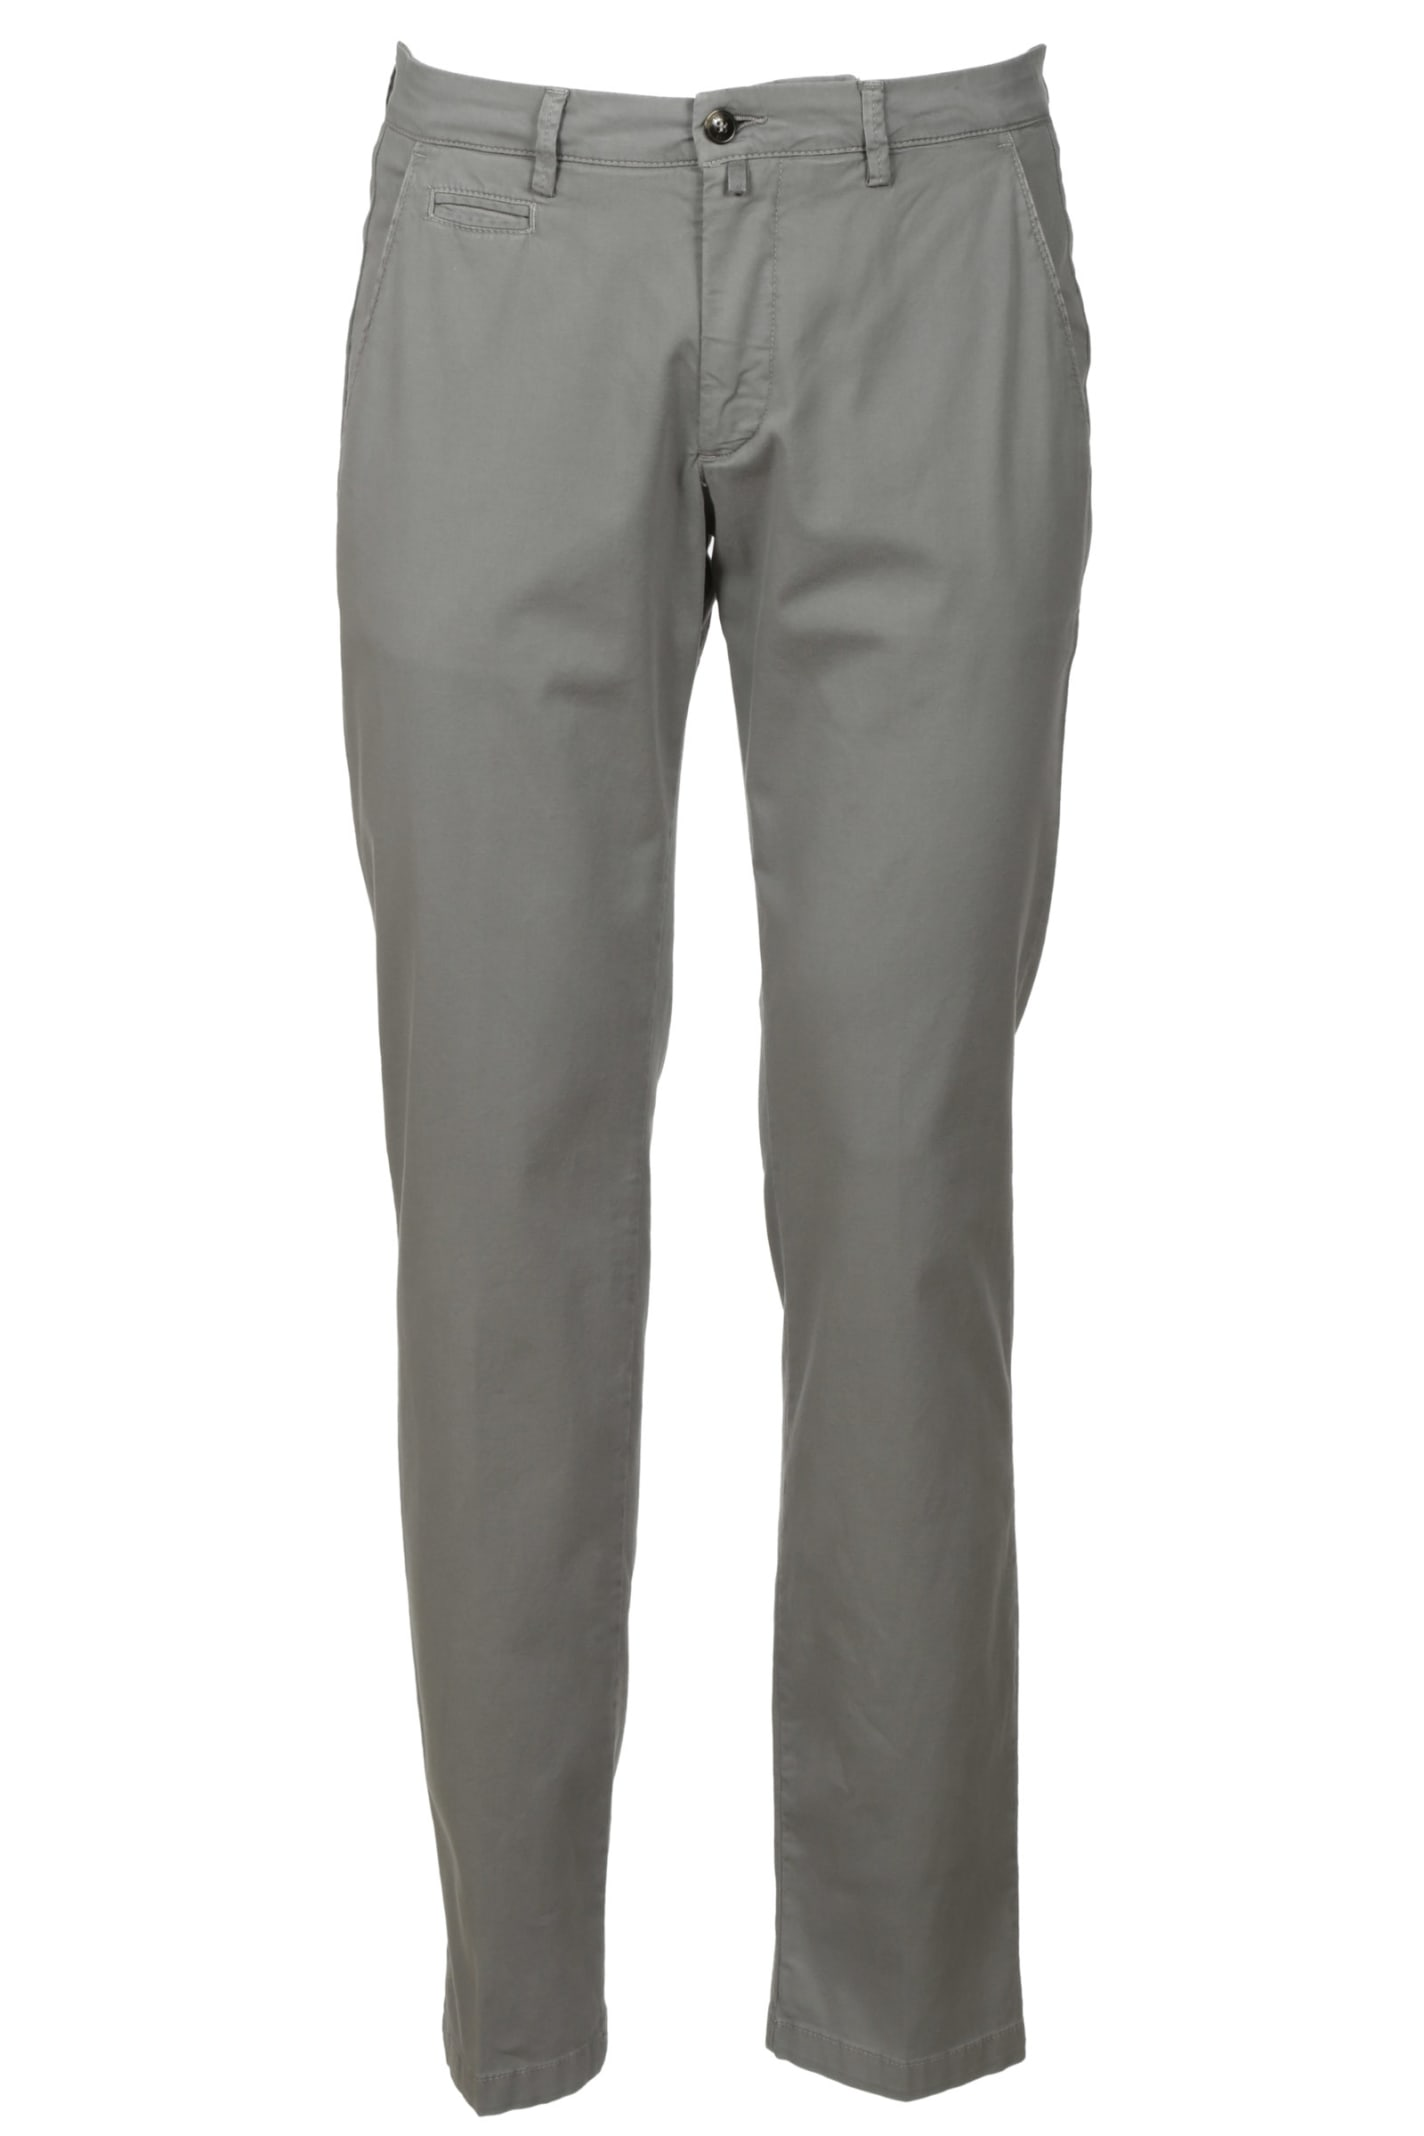 1949 Classic Plain Trousers